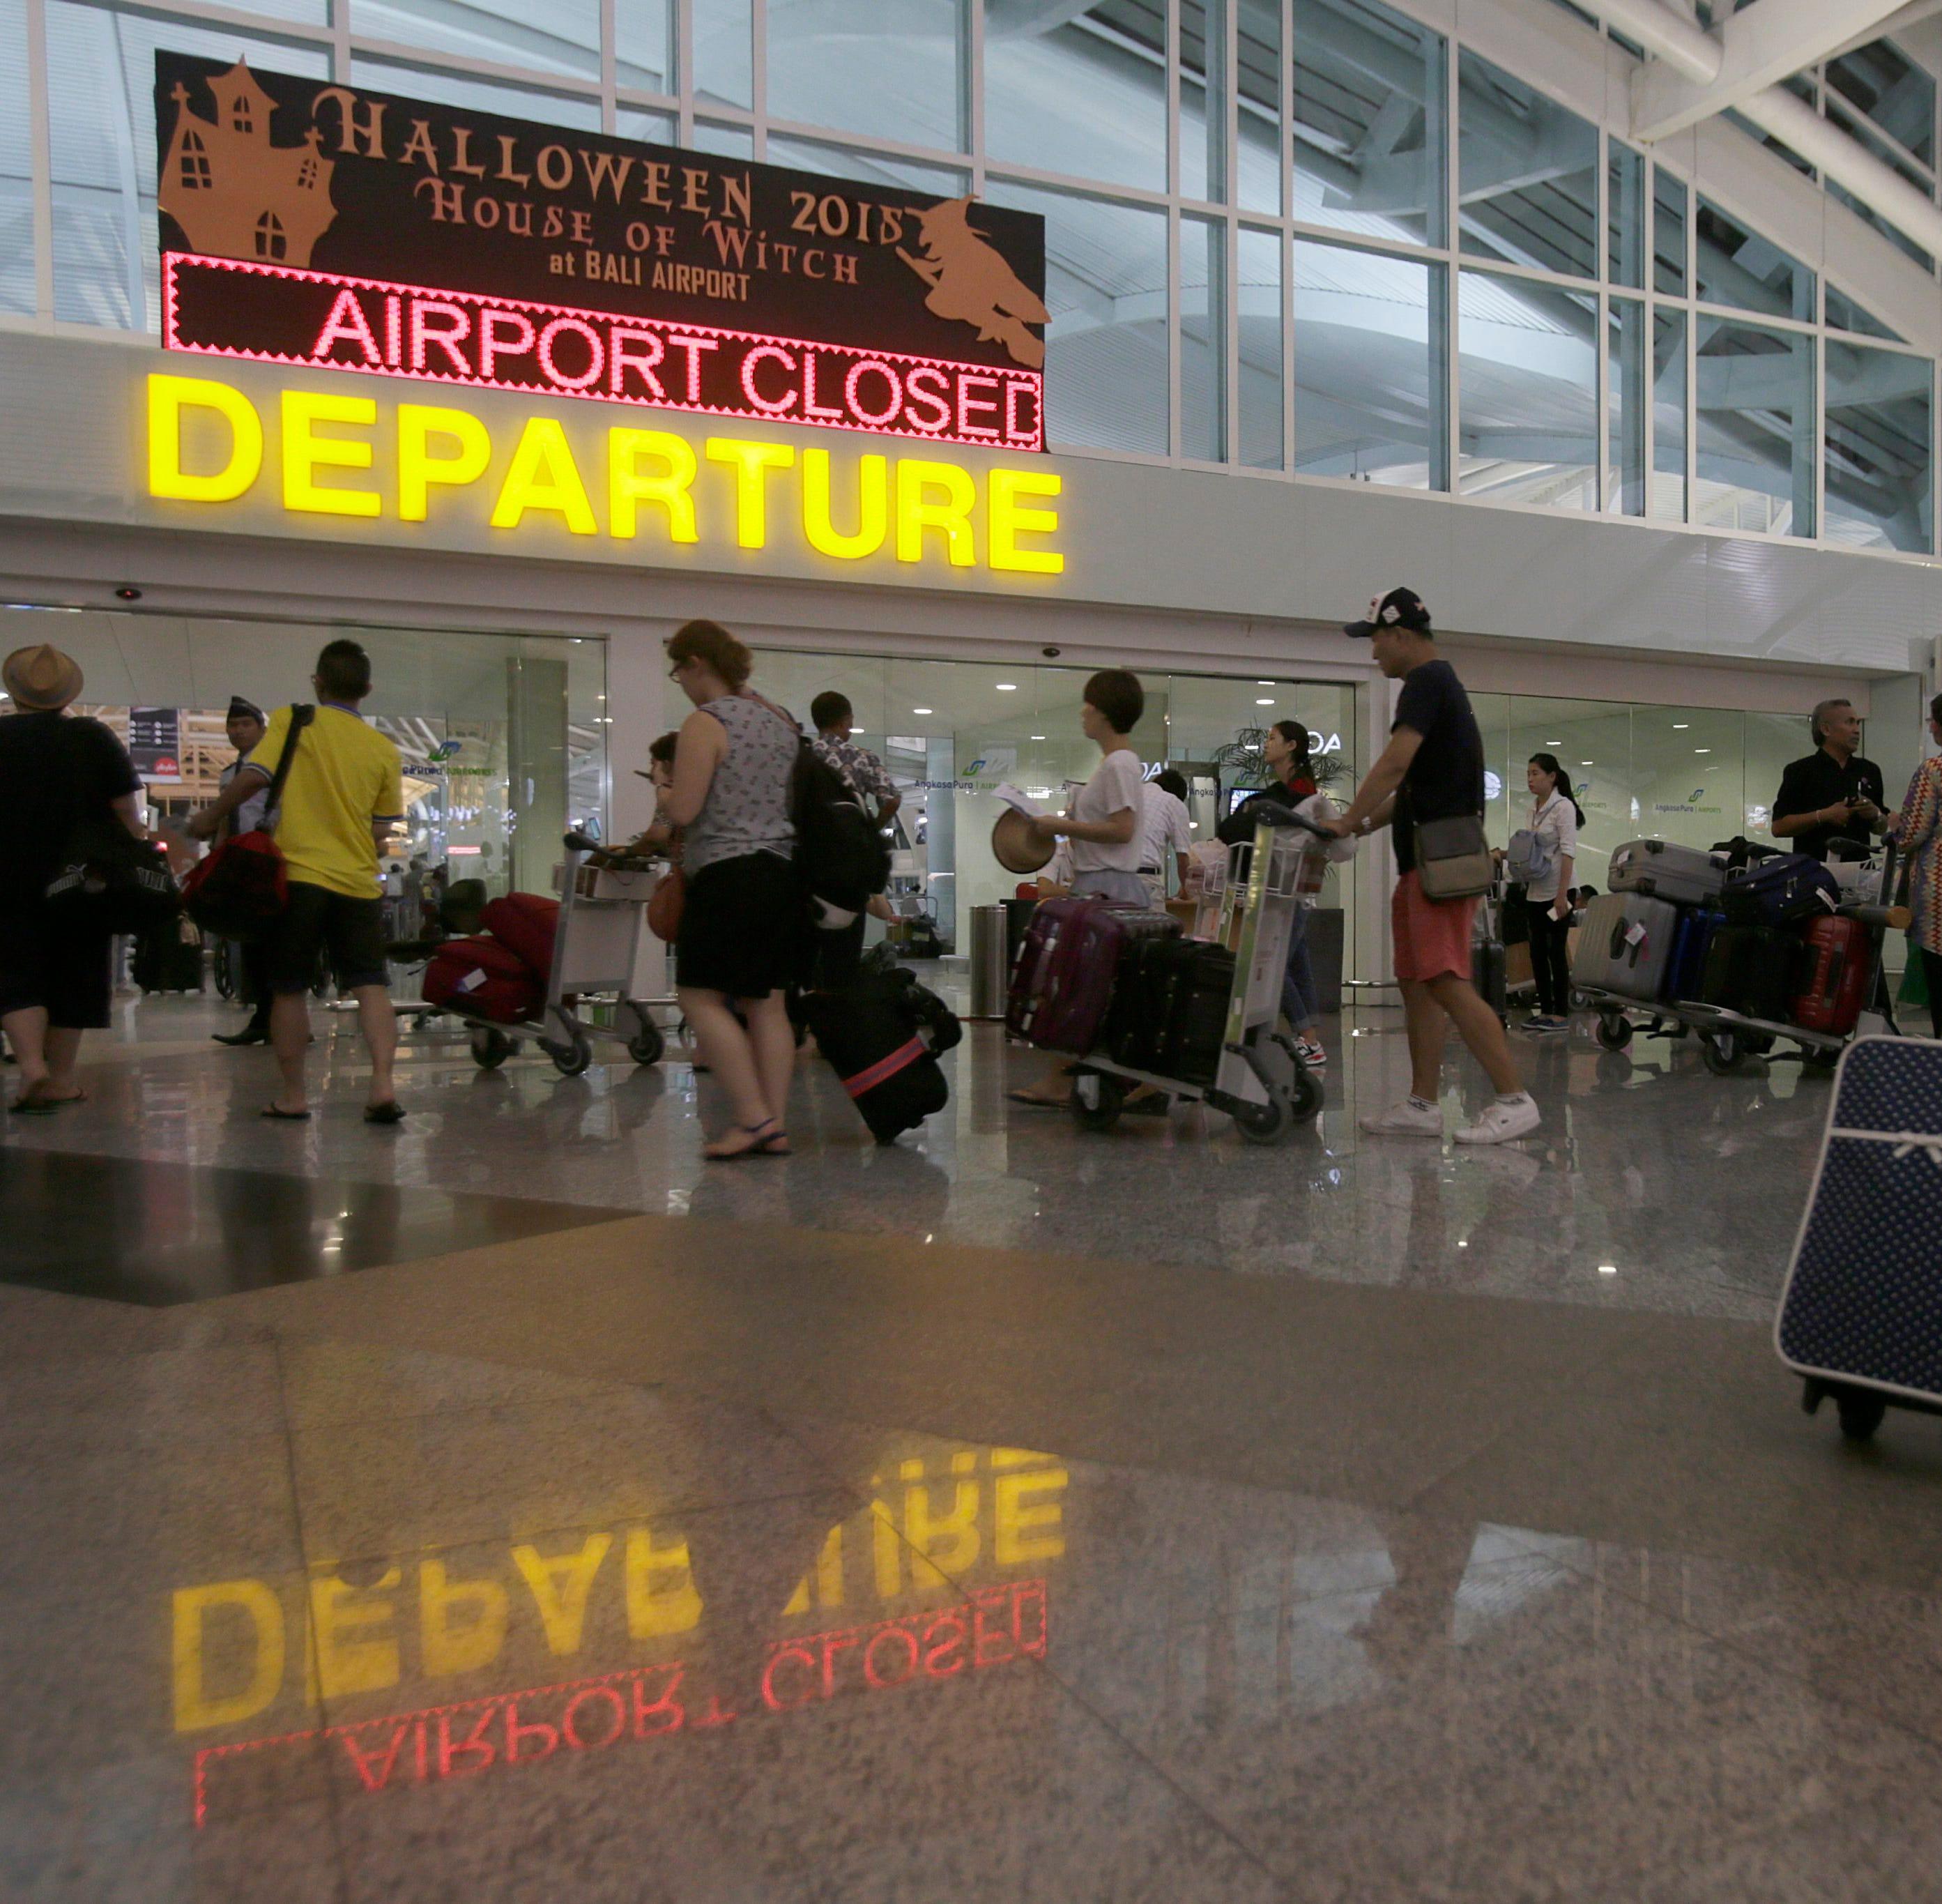 Passengers wait for their delayed flights at Bali's Ngurah Rai International Airport in Bali, Indonesia on Nov. 3, 2015.